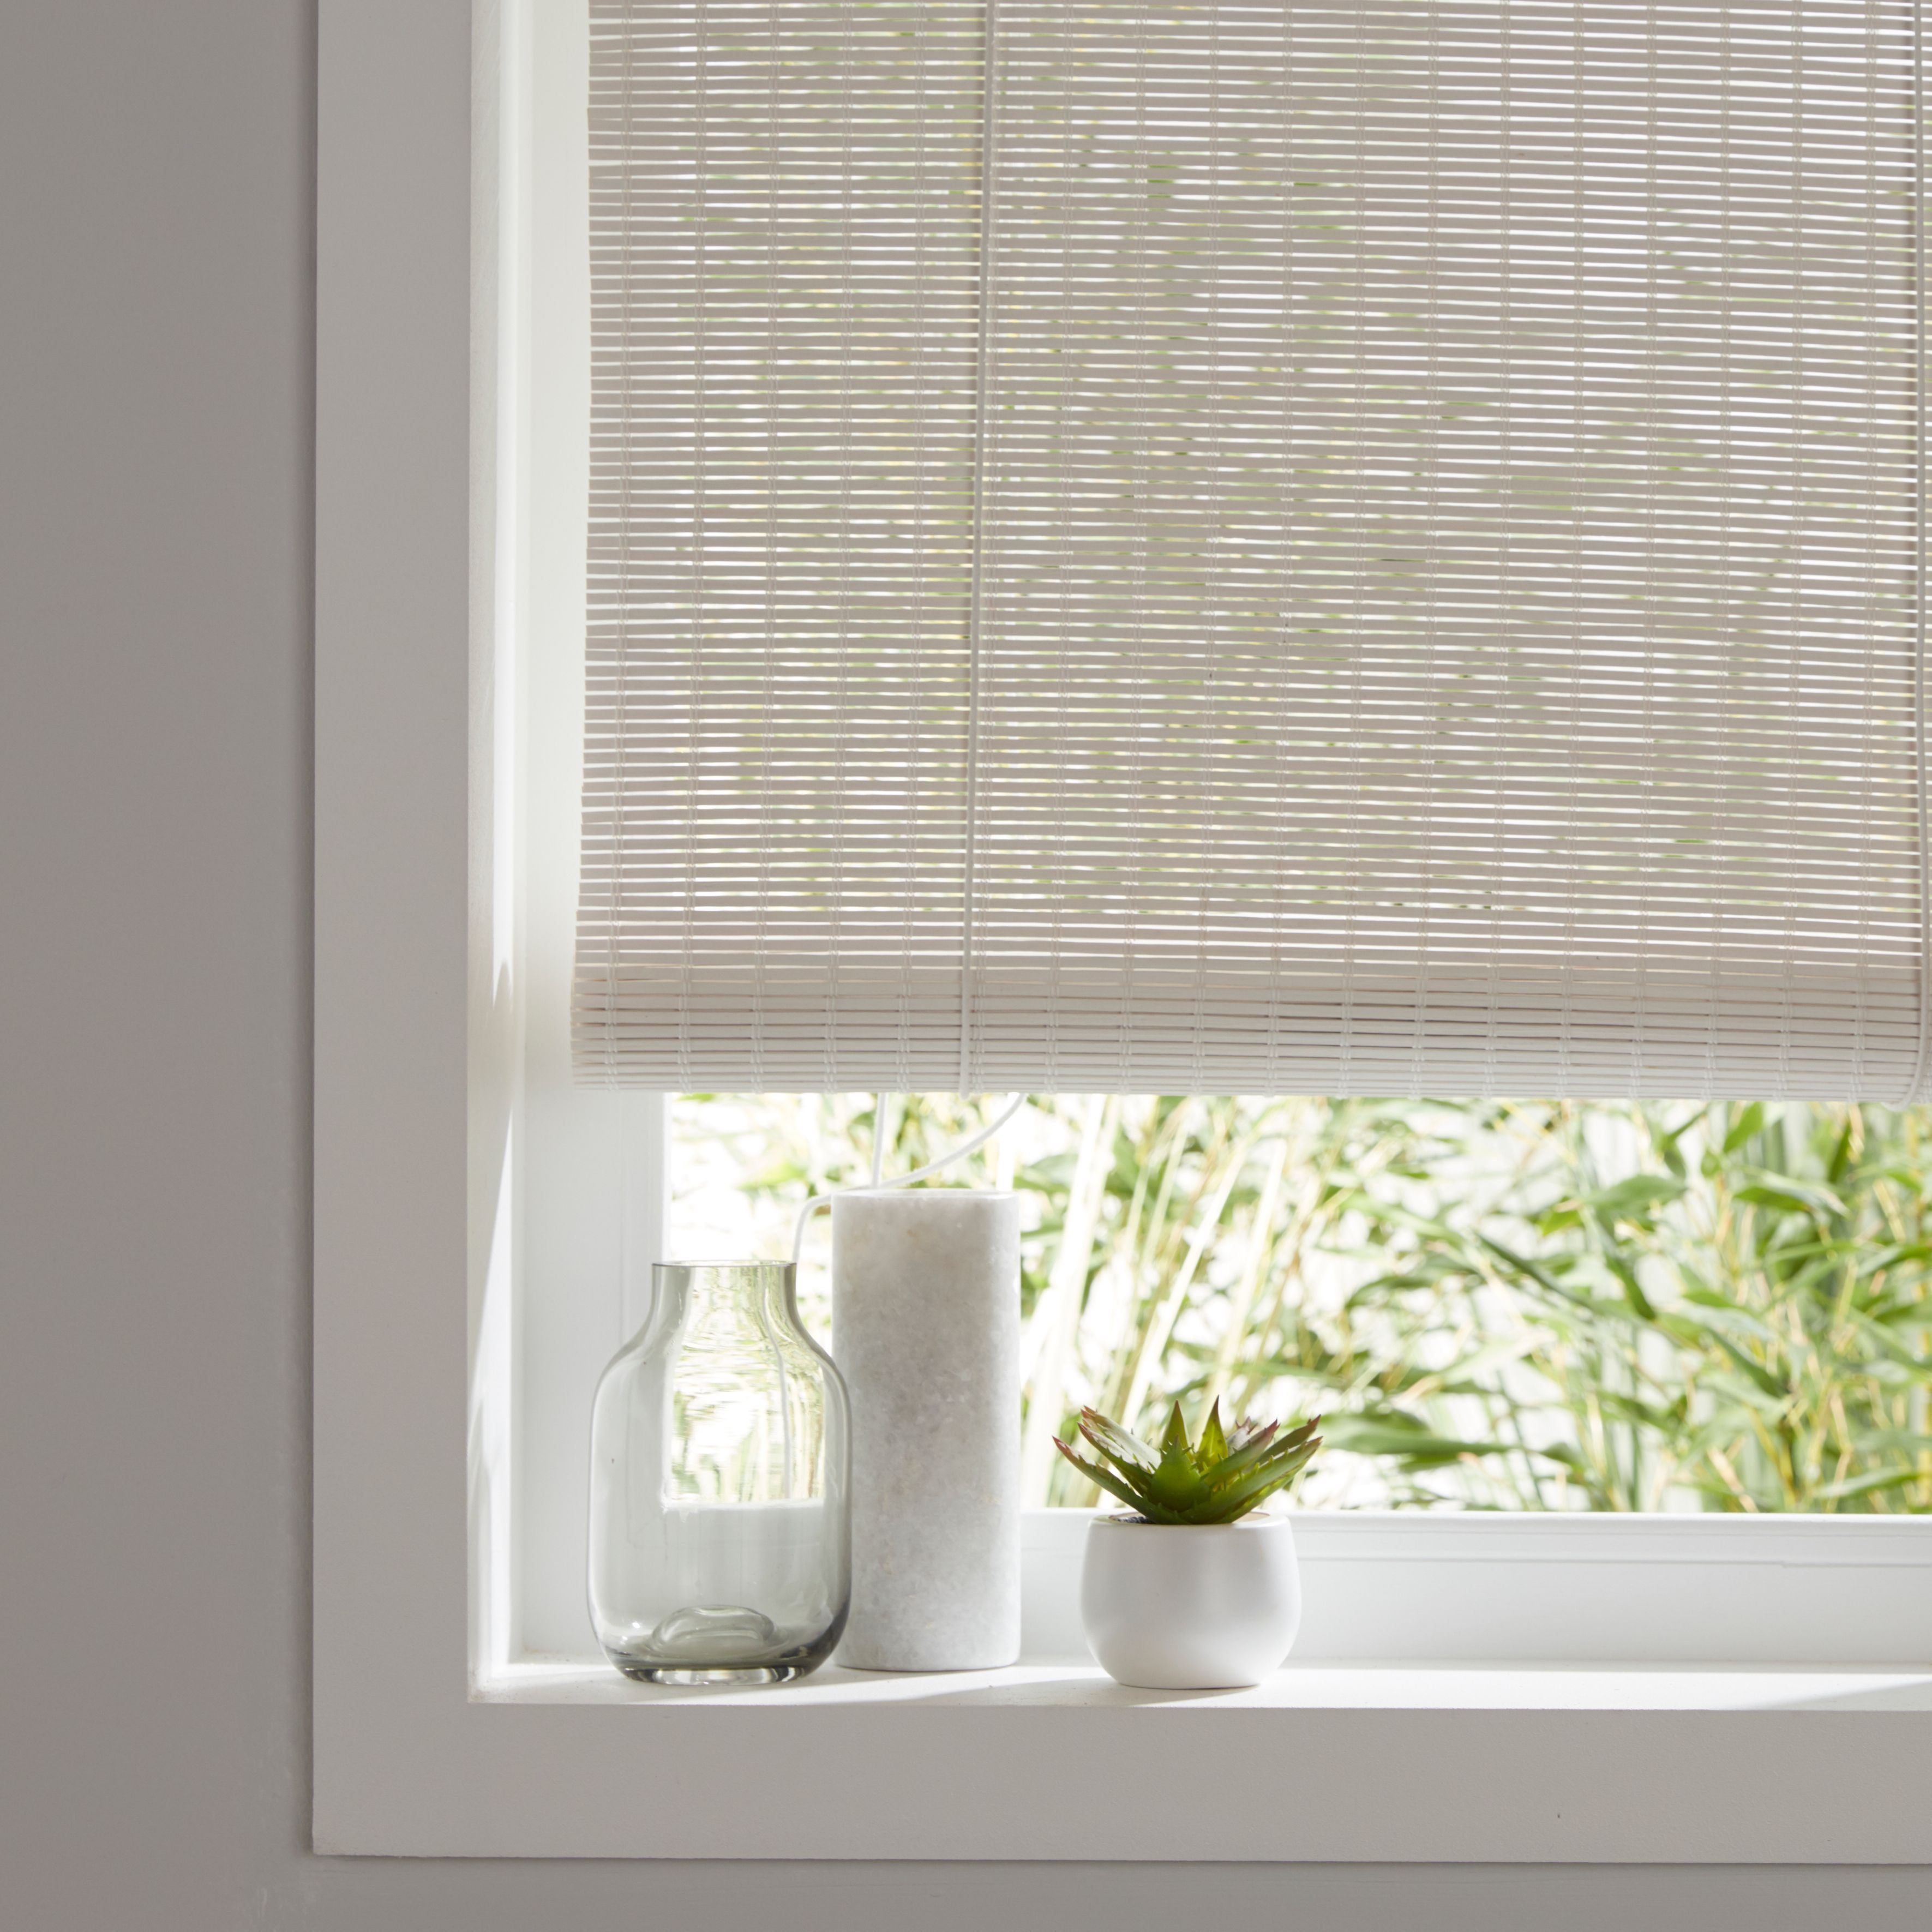 4 Astonishing Diy Ideas Kitchen Blinds Black Blinds For Windows